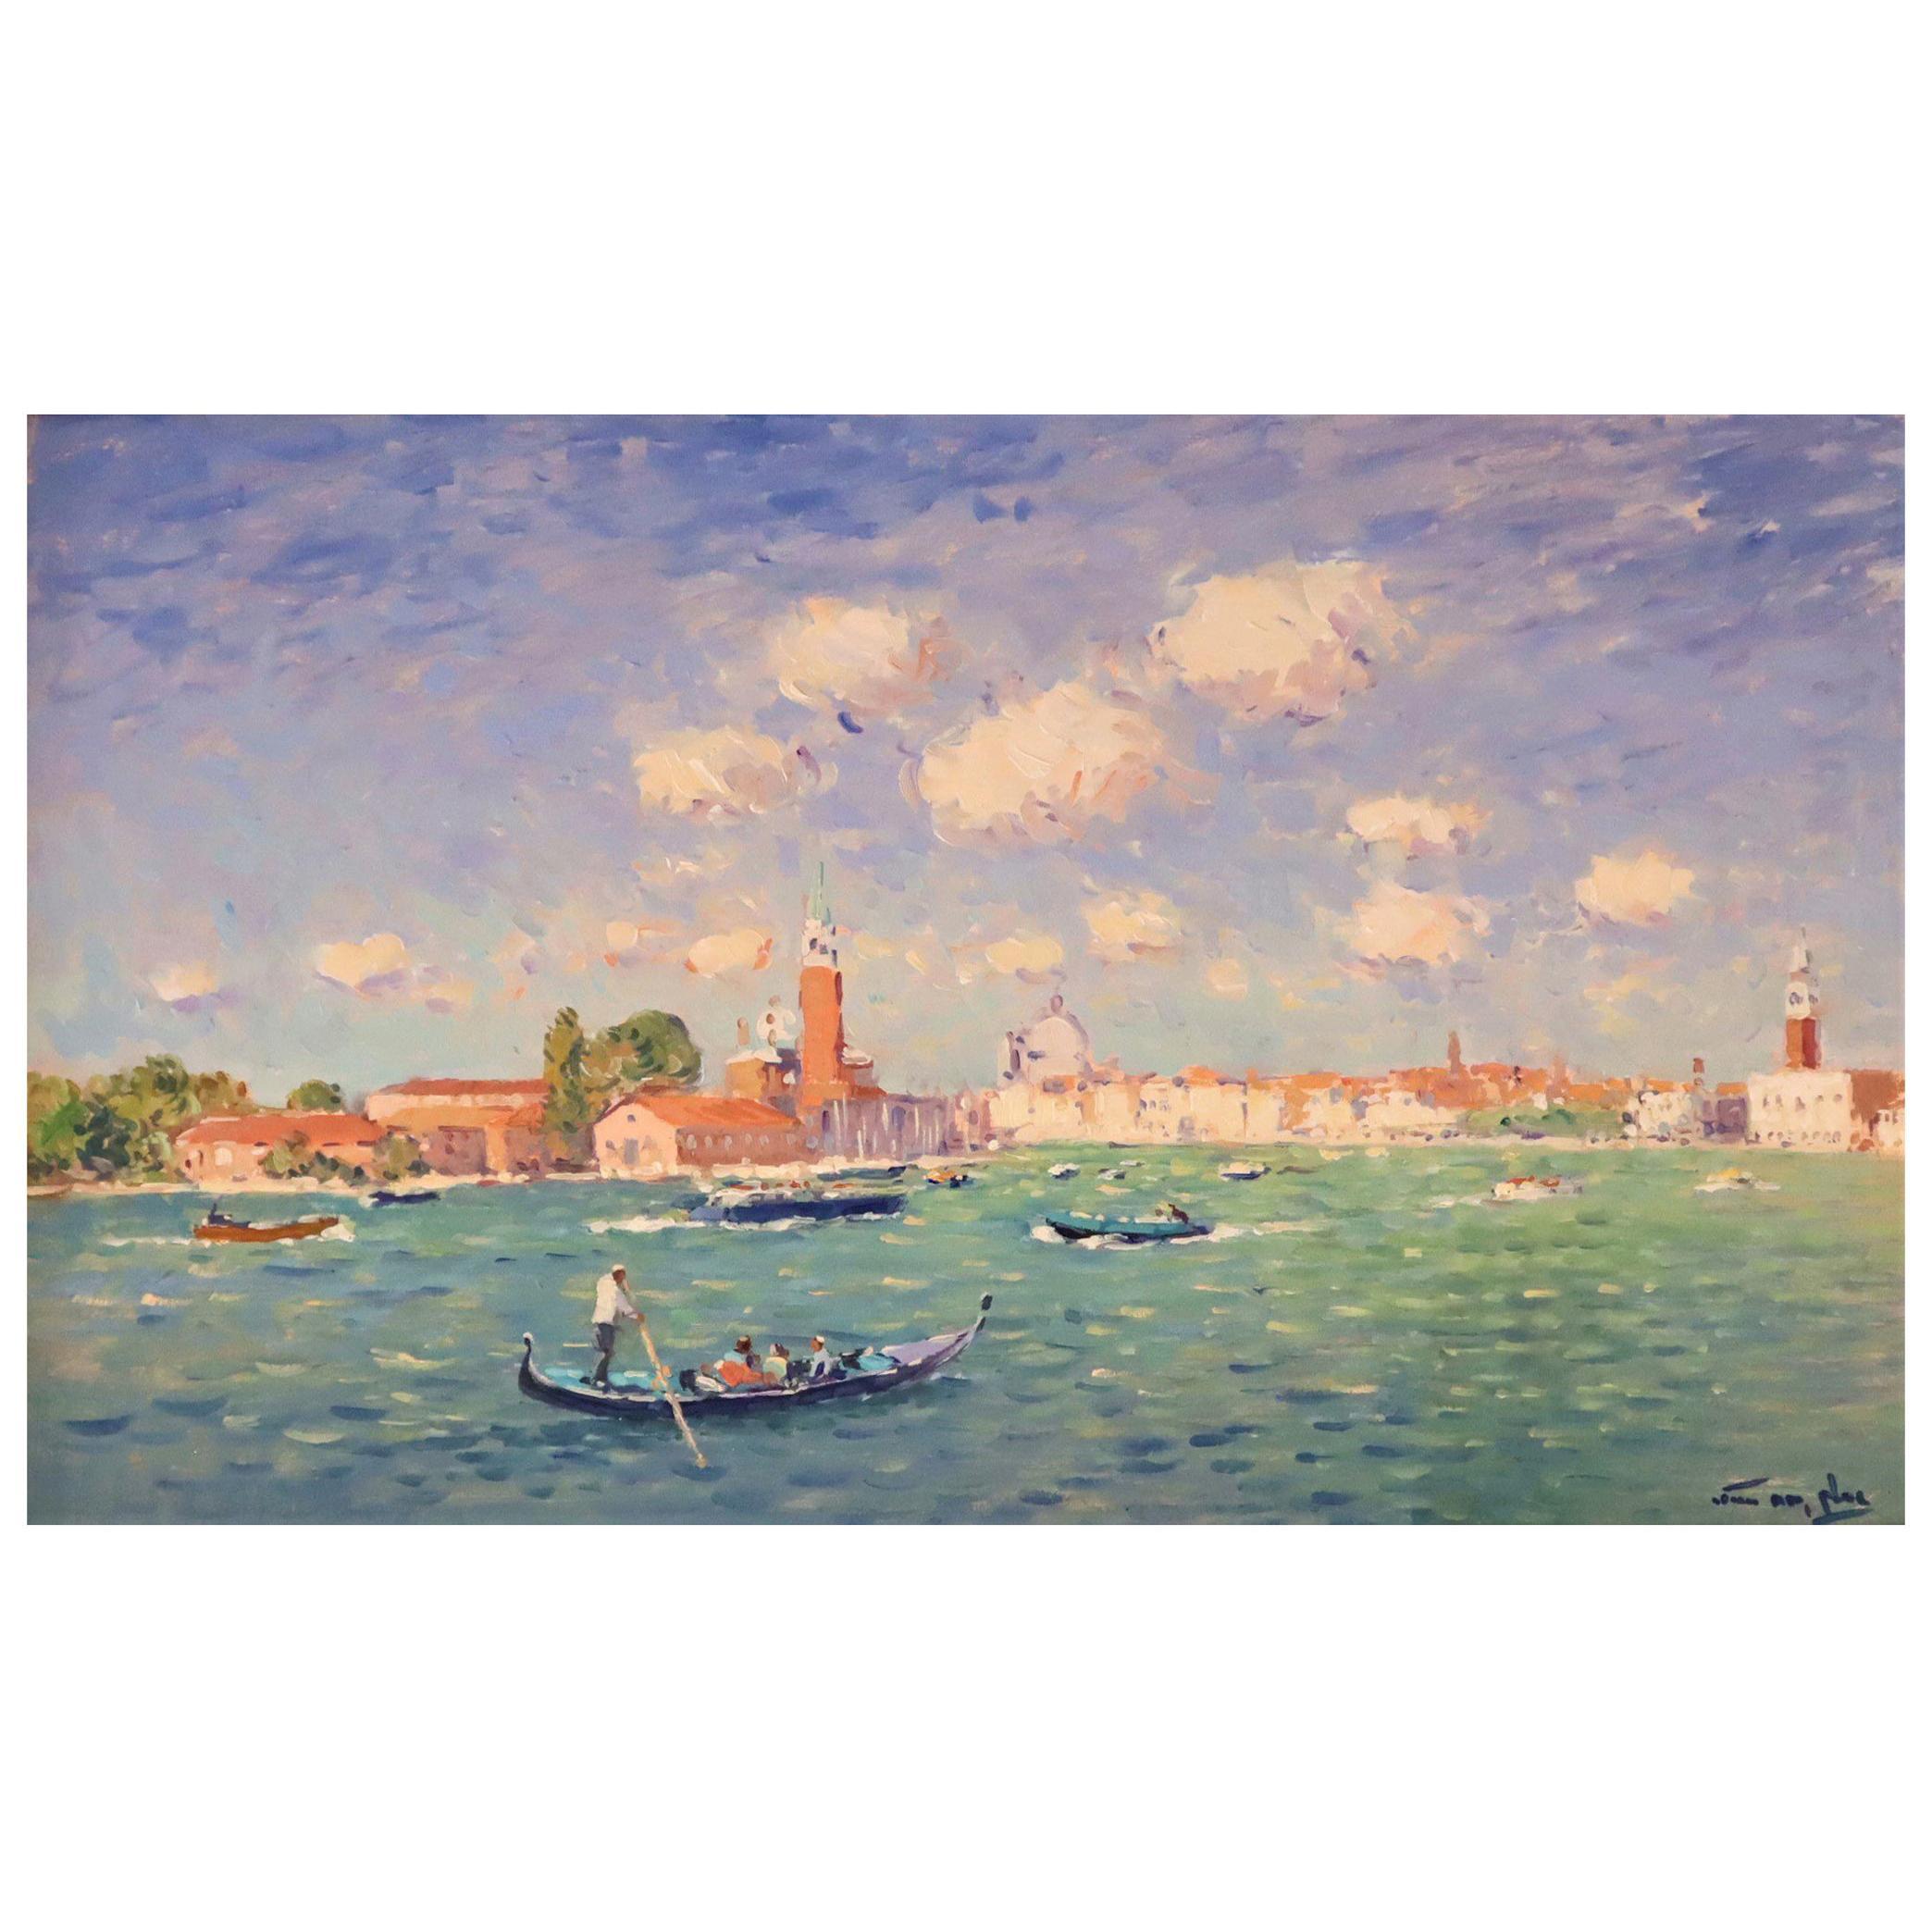 Niek van der Plas, Venise, Oil on Canvas